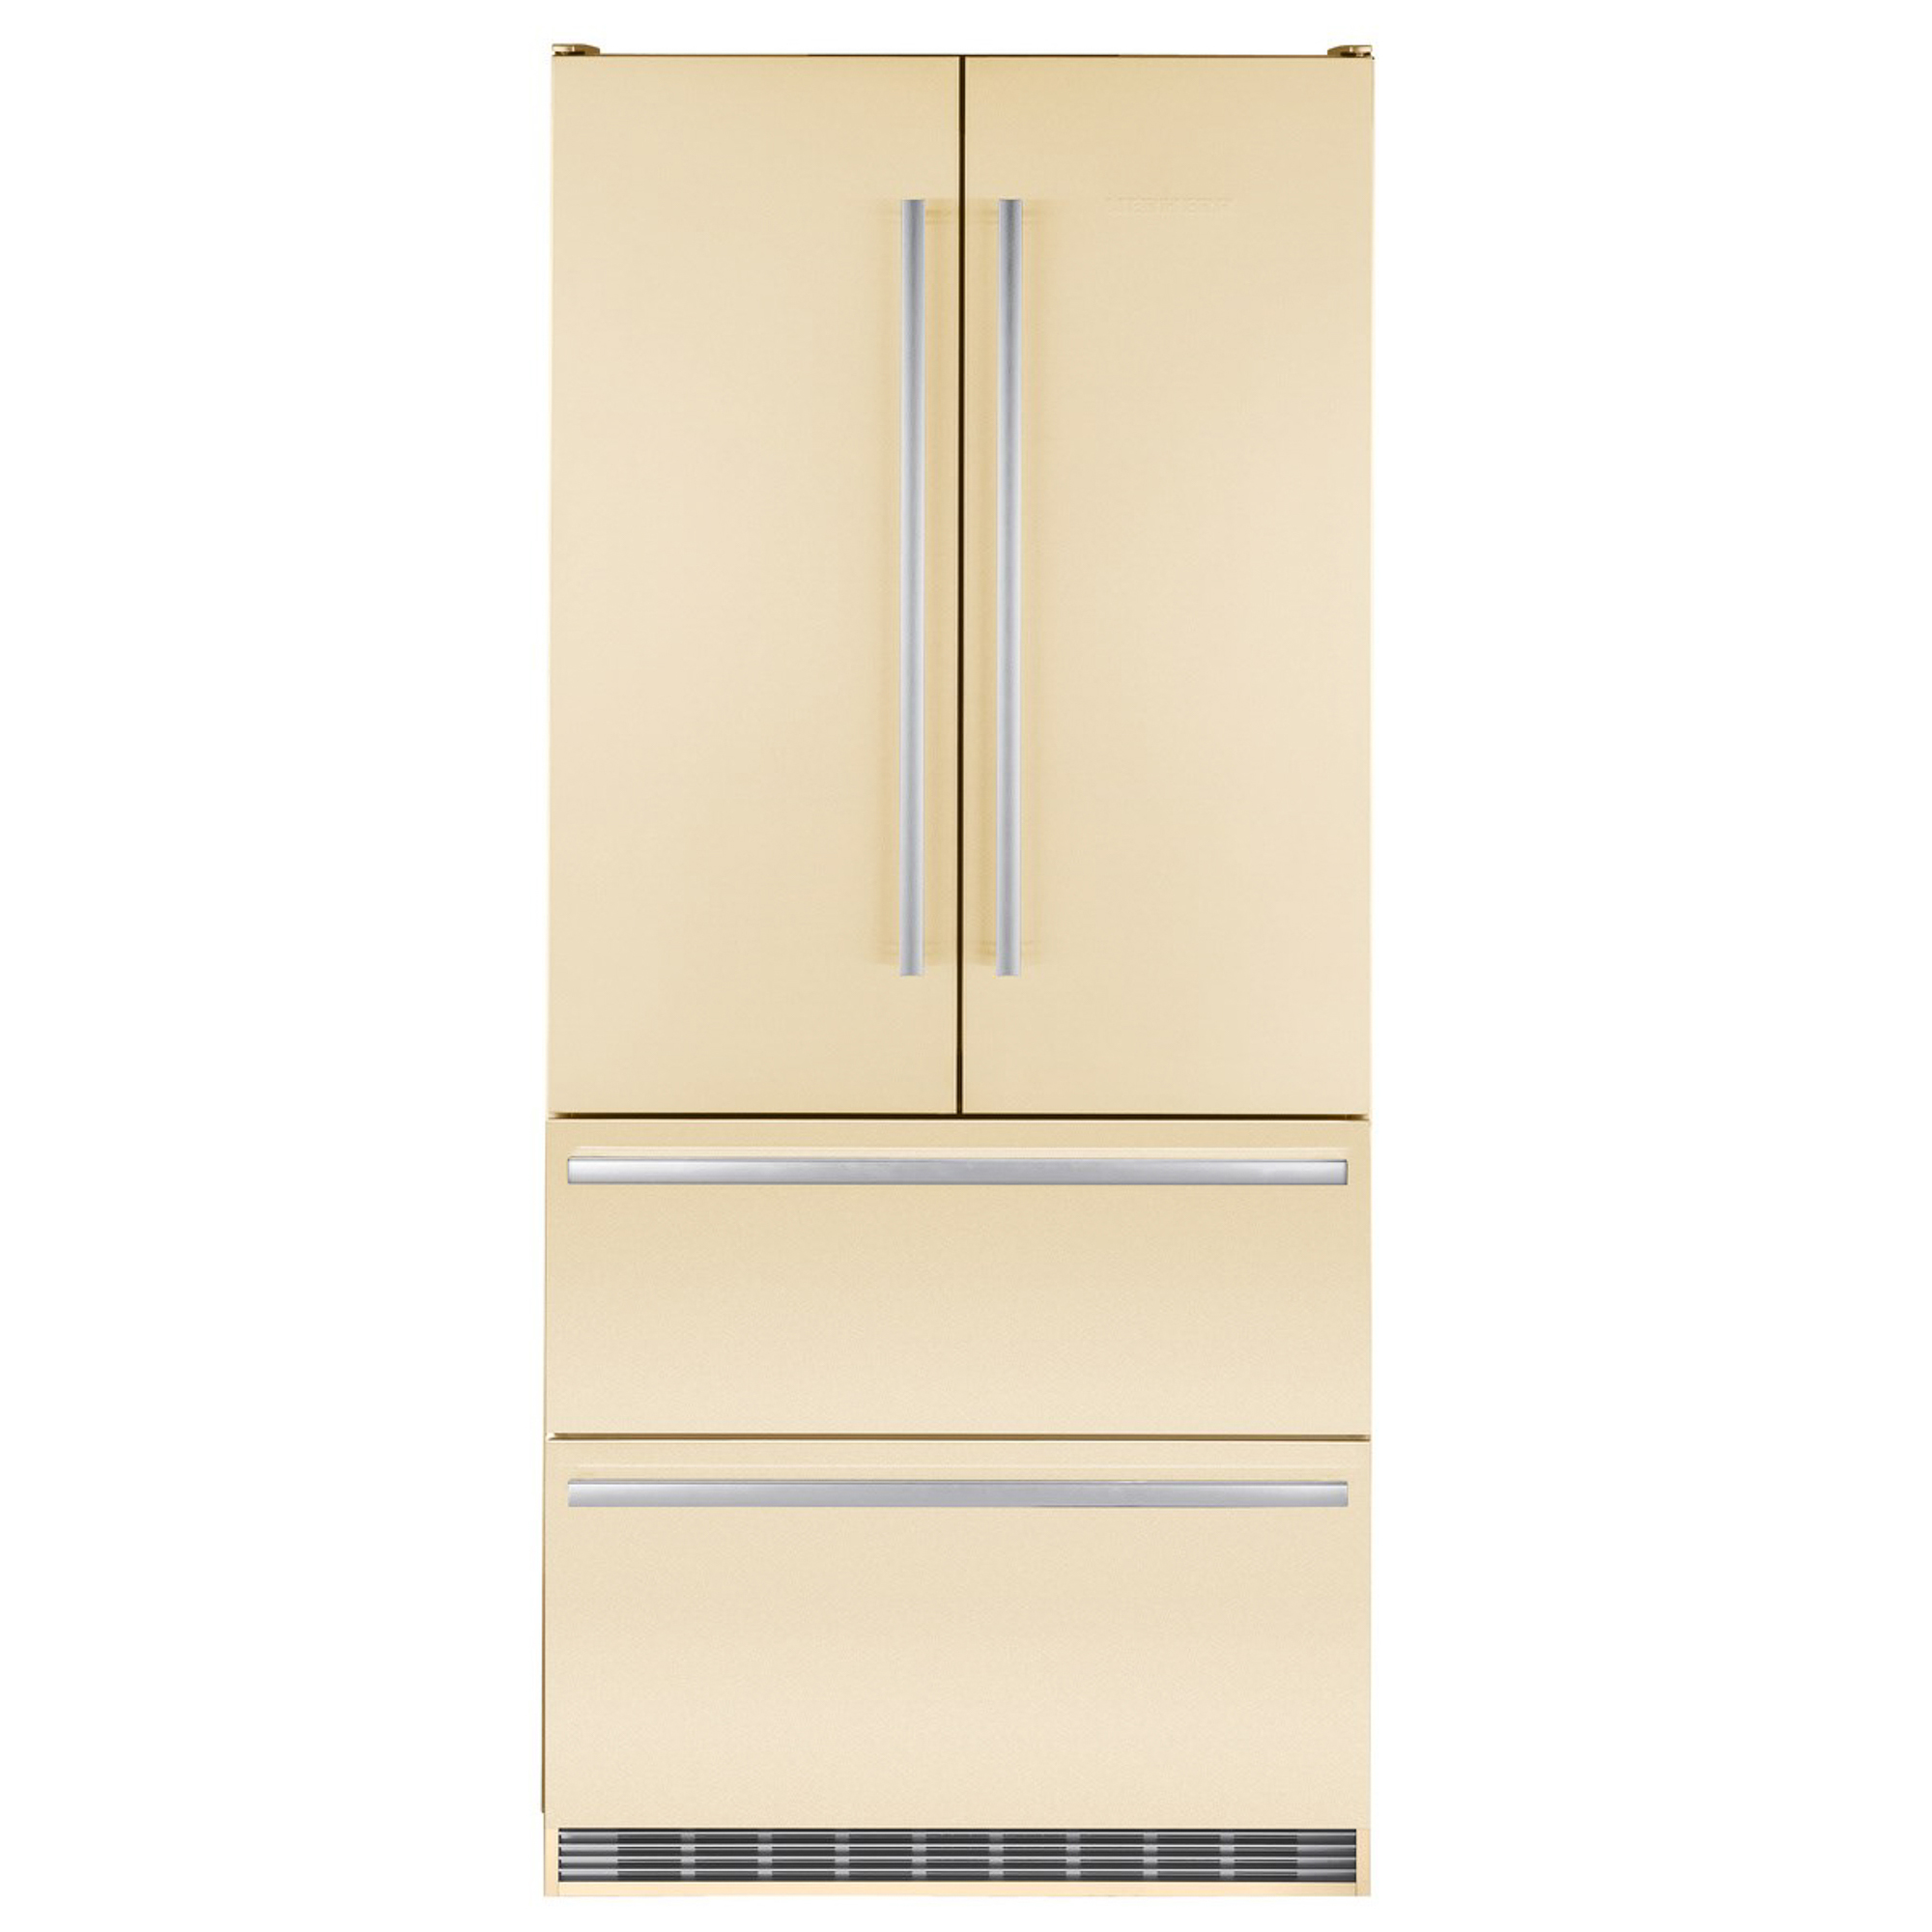 Холодильник Liebherr CBNBE 6256 Beige